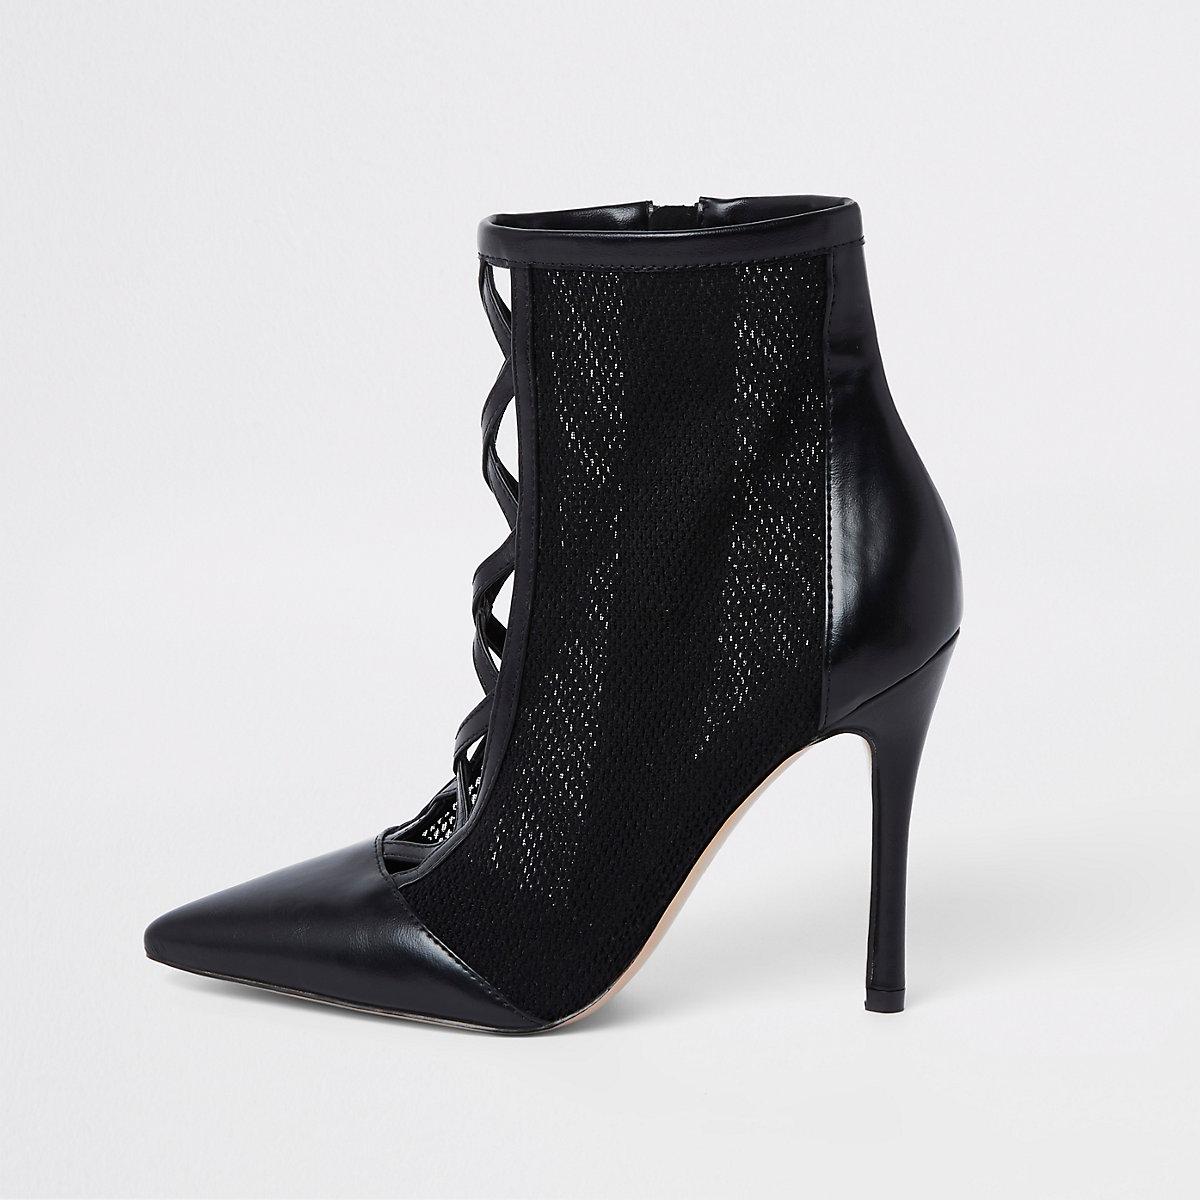 Black mesh stiletto heel ankle boots